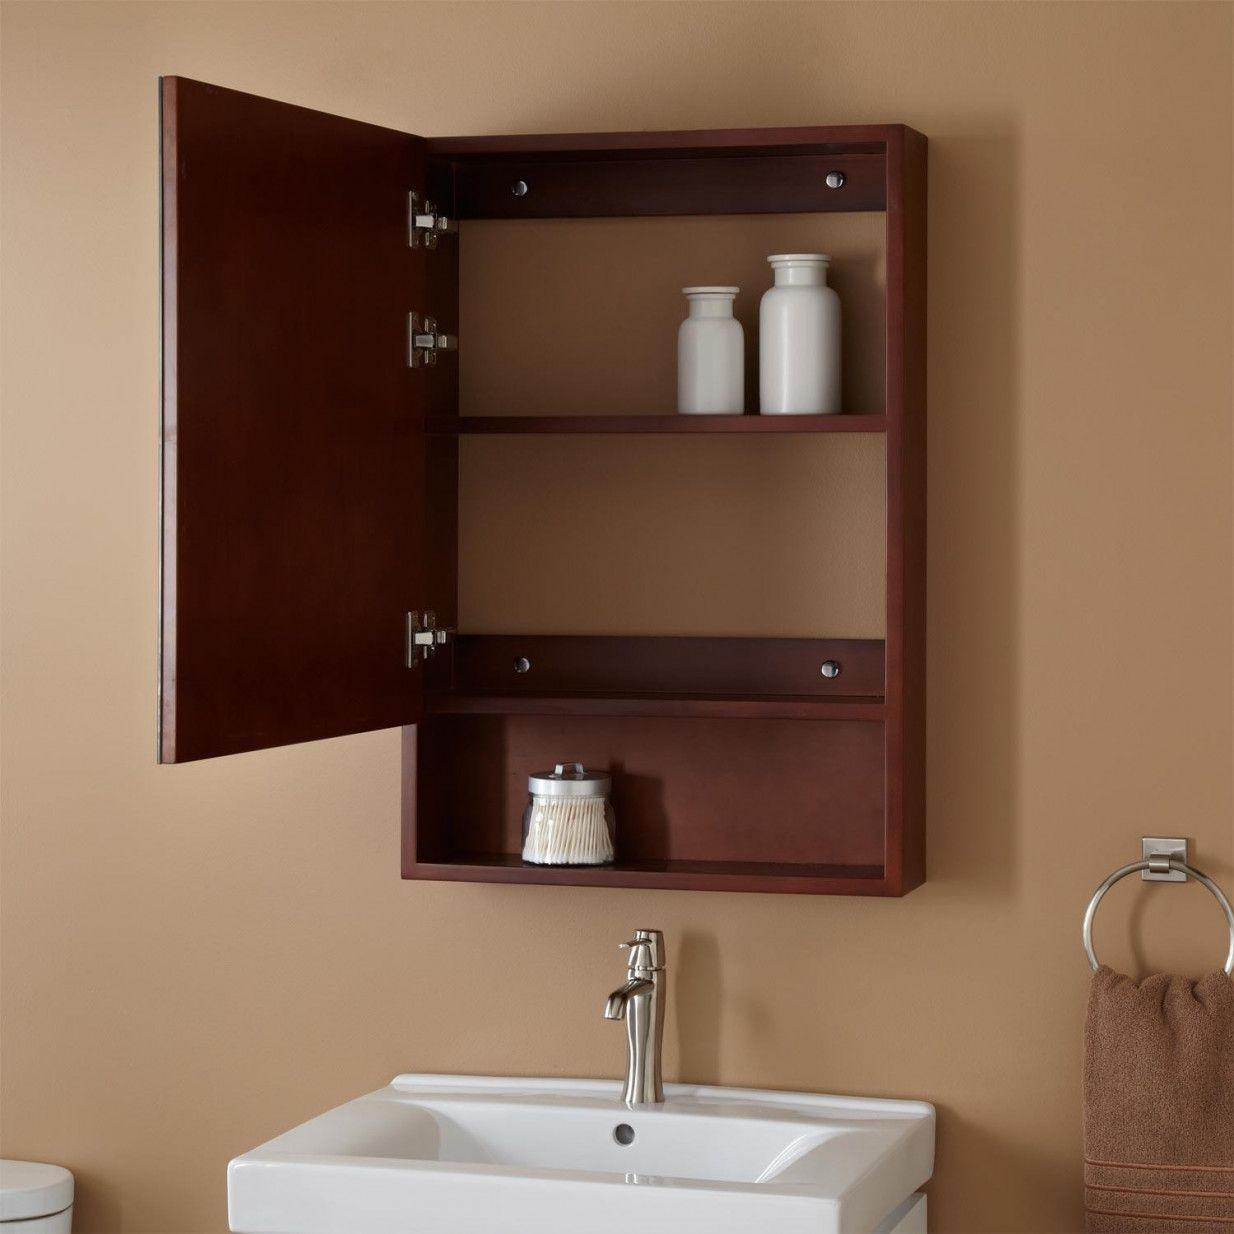 20 bathroom wall cabinet cherry best interior paint brands check rh pinterest com bathroom wall cabinets dark cherry bathroom wall cabinets dark cherry